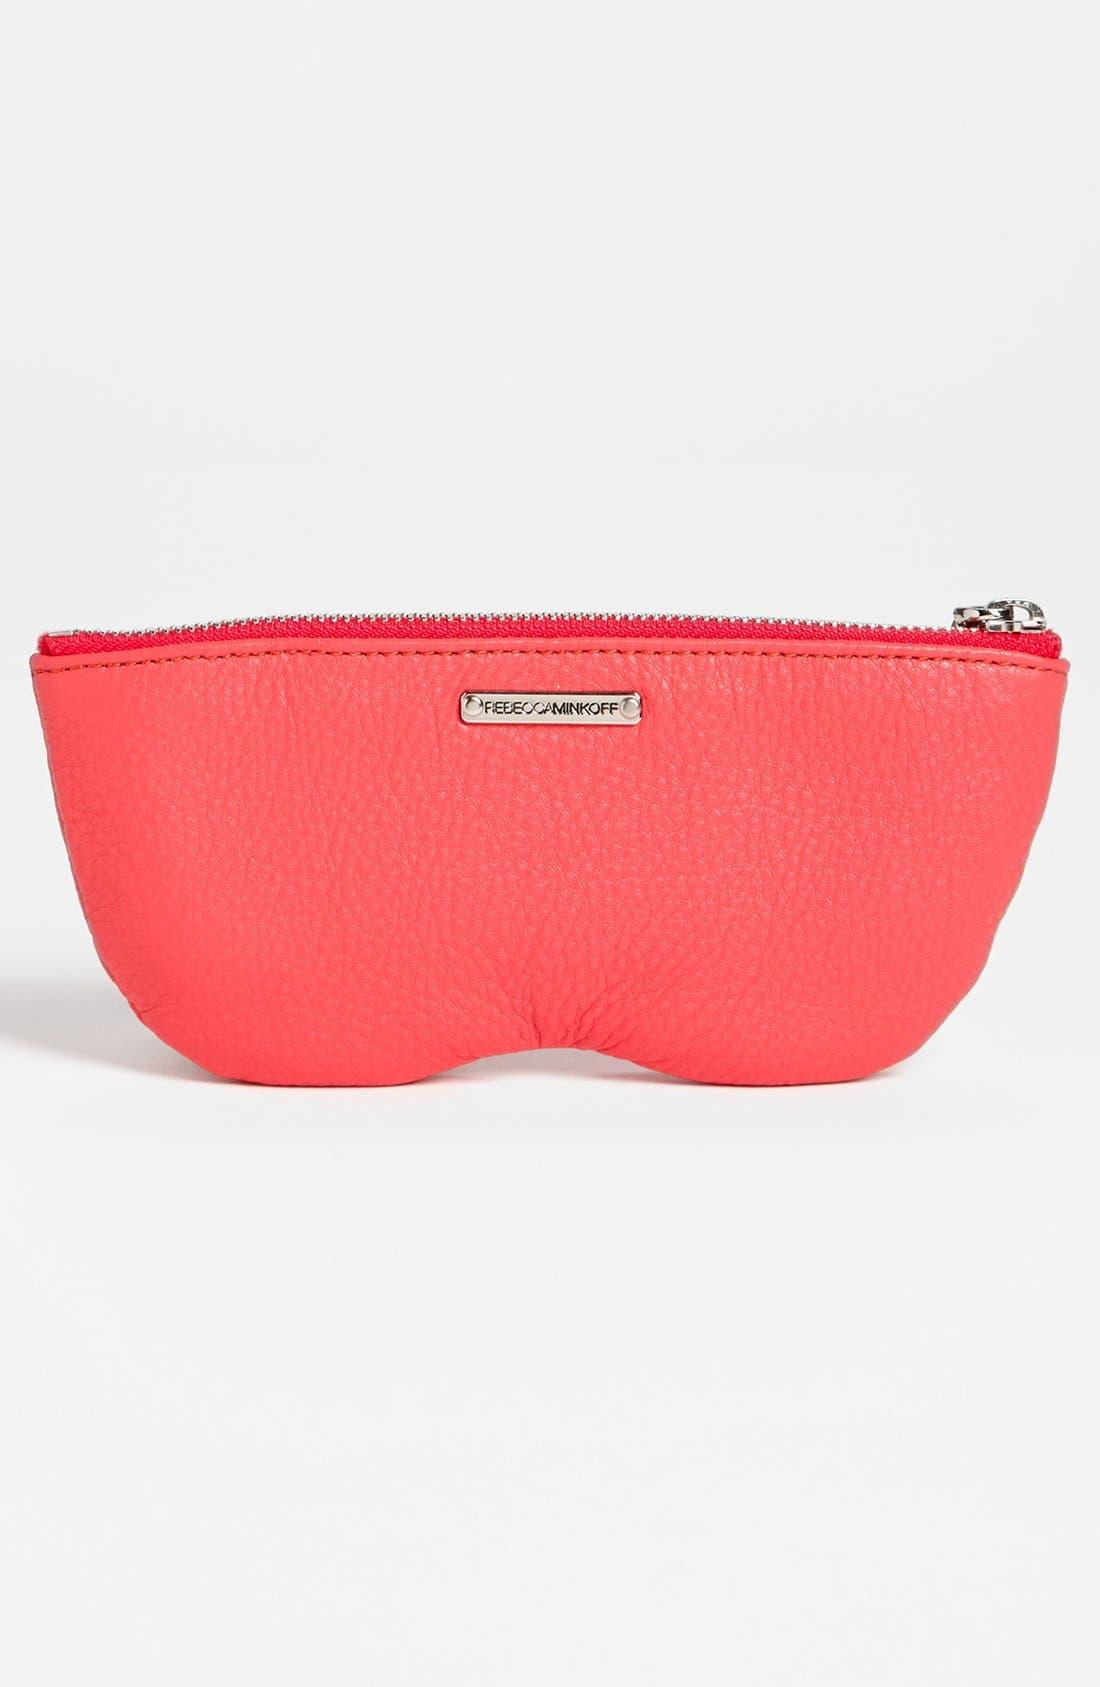 Alternate Image 2  - Rebecca Minkoff Leather Sunglasses Case